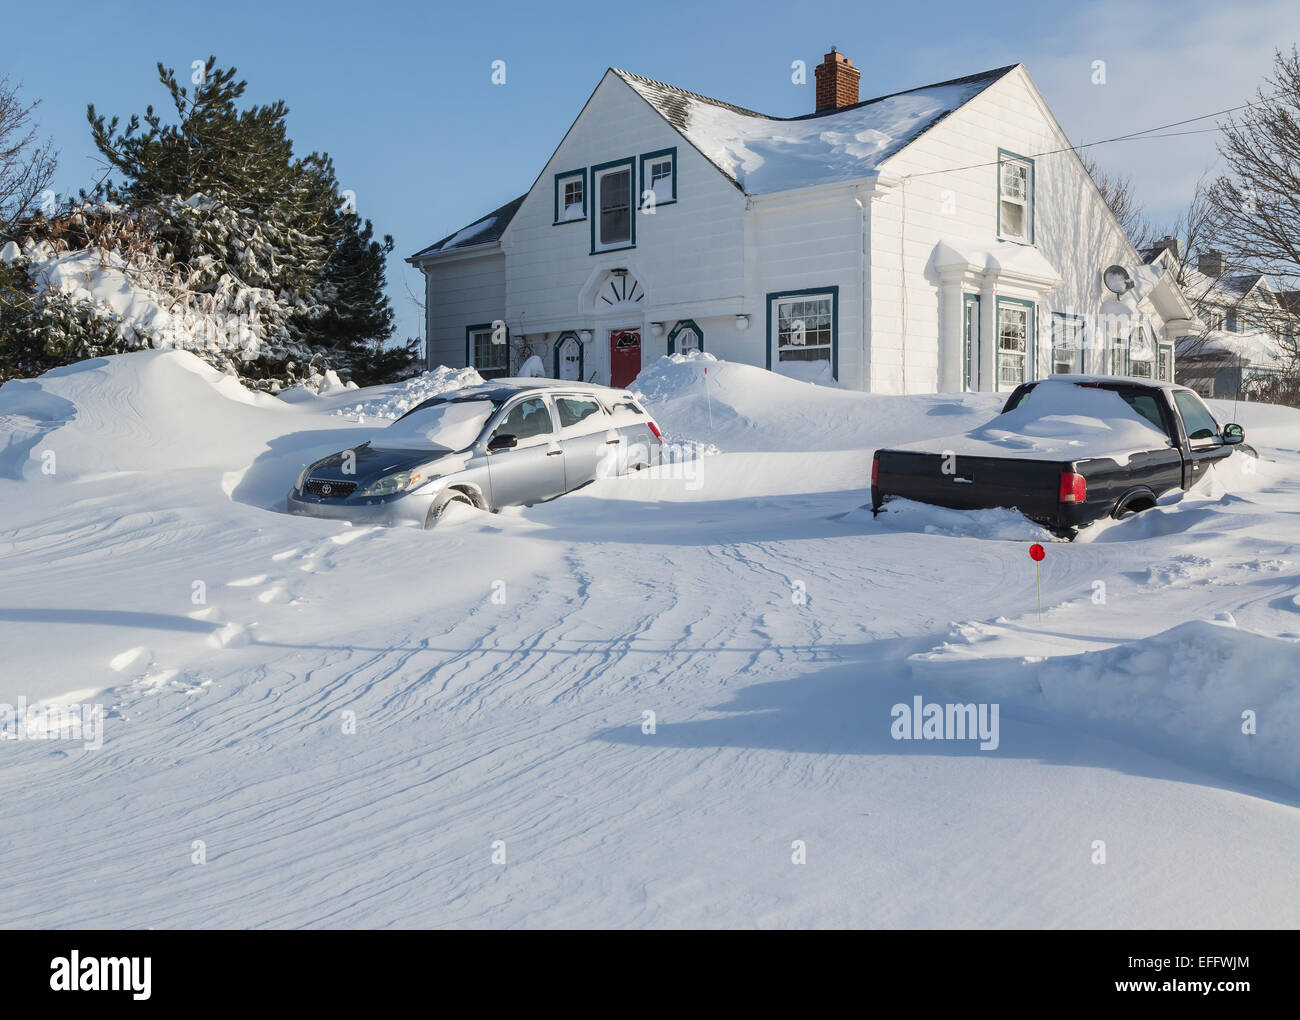 Environment Canada Prince Edward Island Weather Forecast